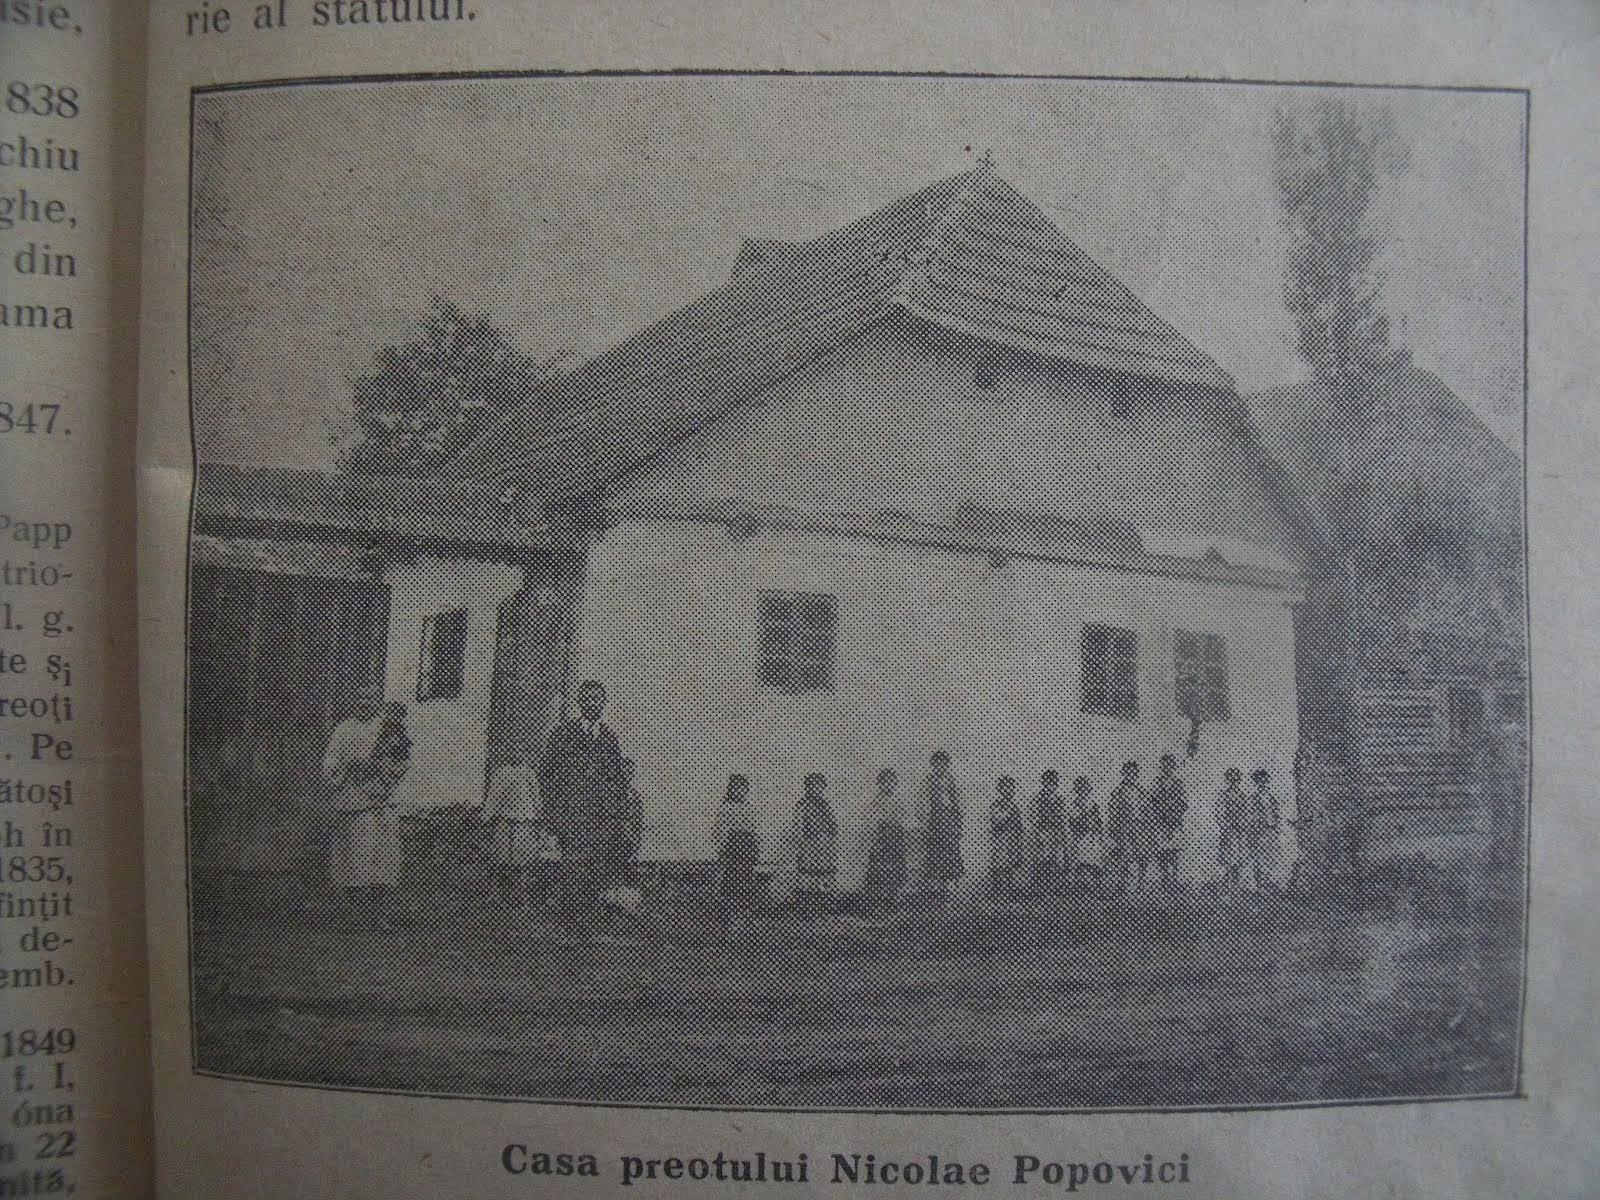 Casa preotului Nicolae Popovici